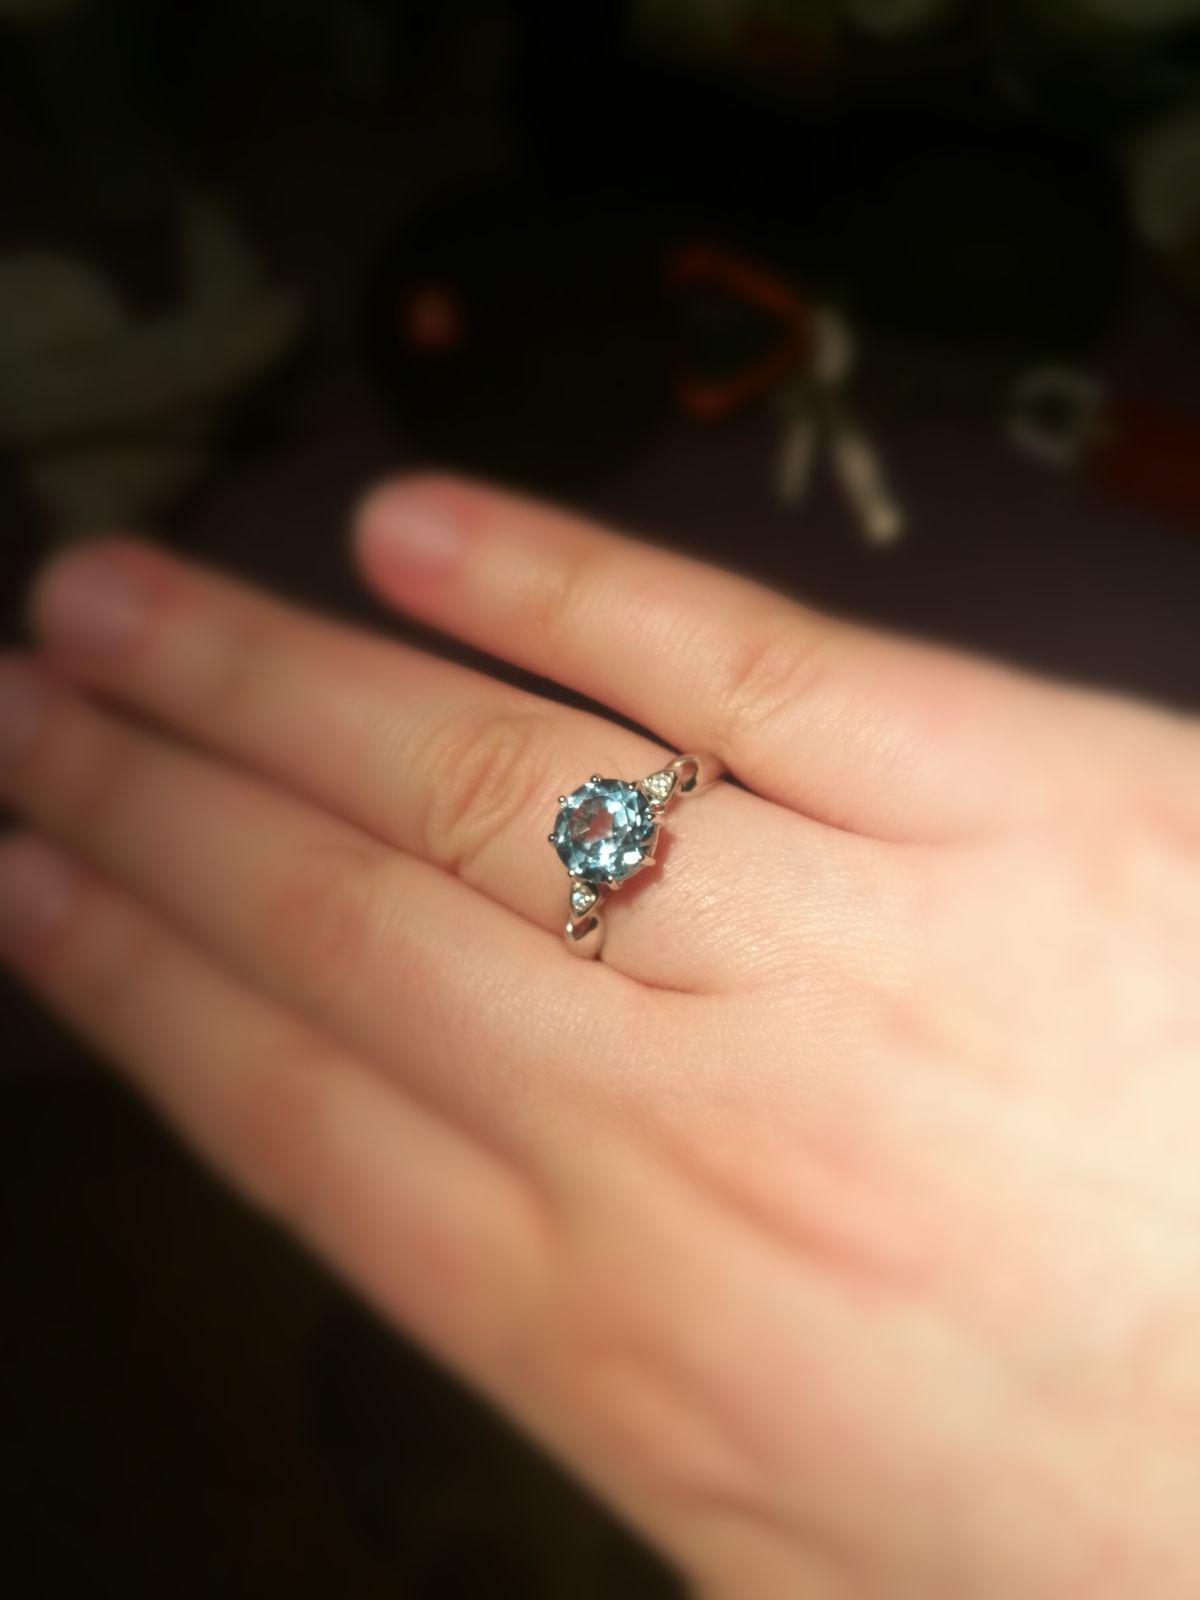 Шикарное кольцо 😍😍😍